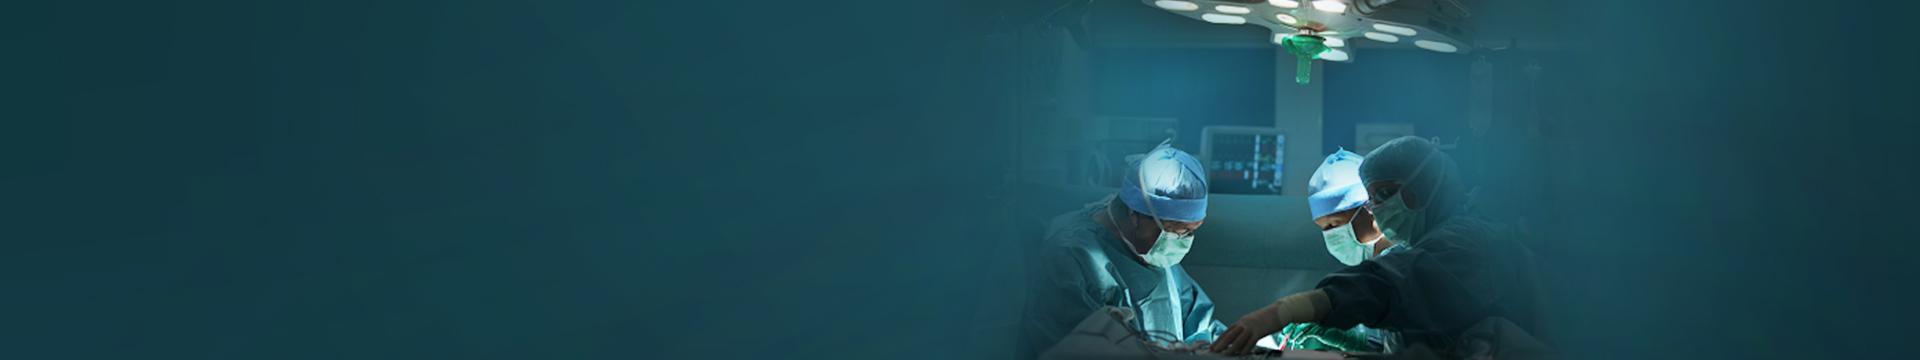 chirurgie holep